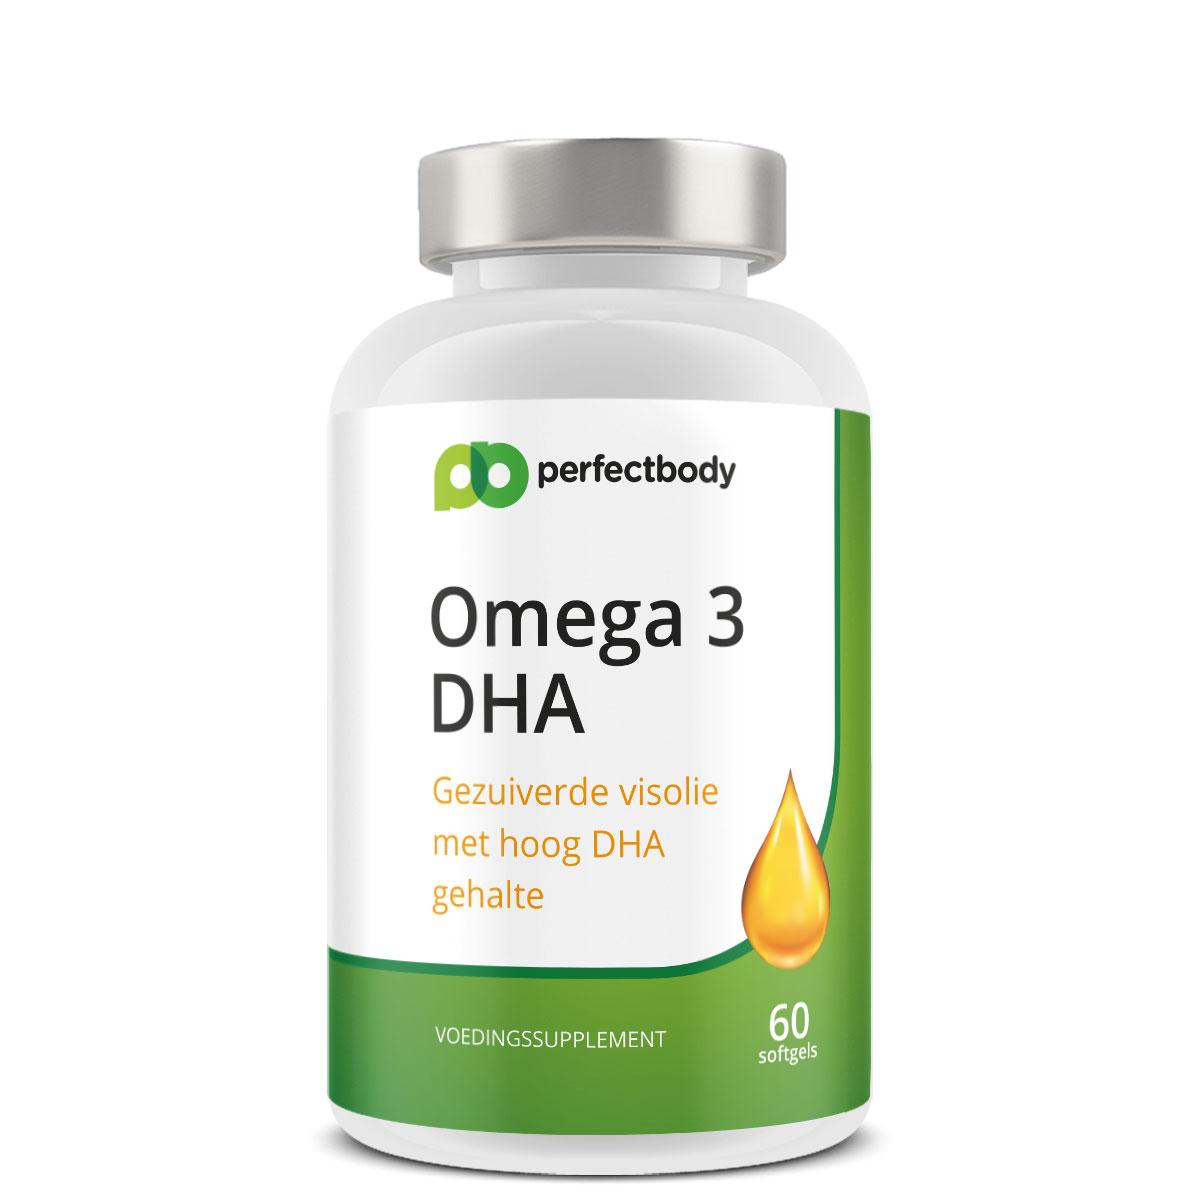 Perfectbody Omega 3 DHA Capsules - 60 Softgels